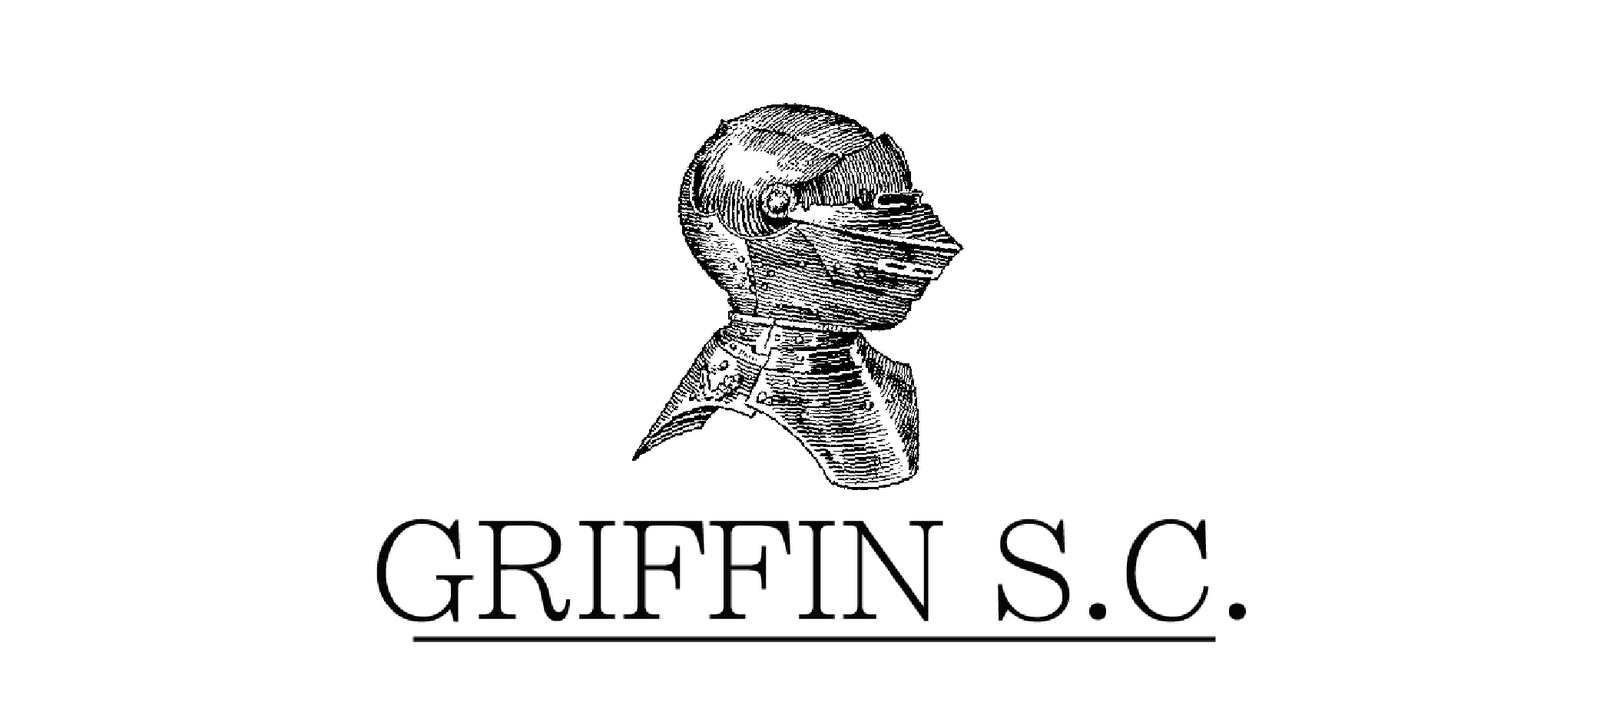 GRIFFIN S.C.